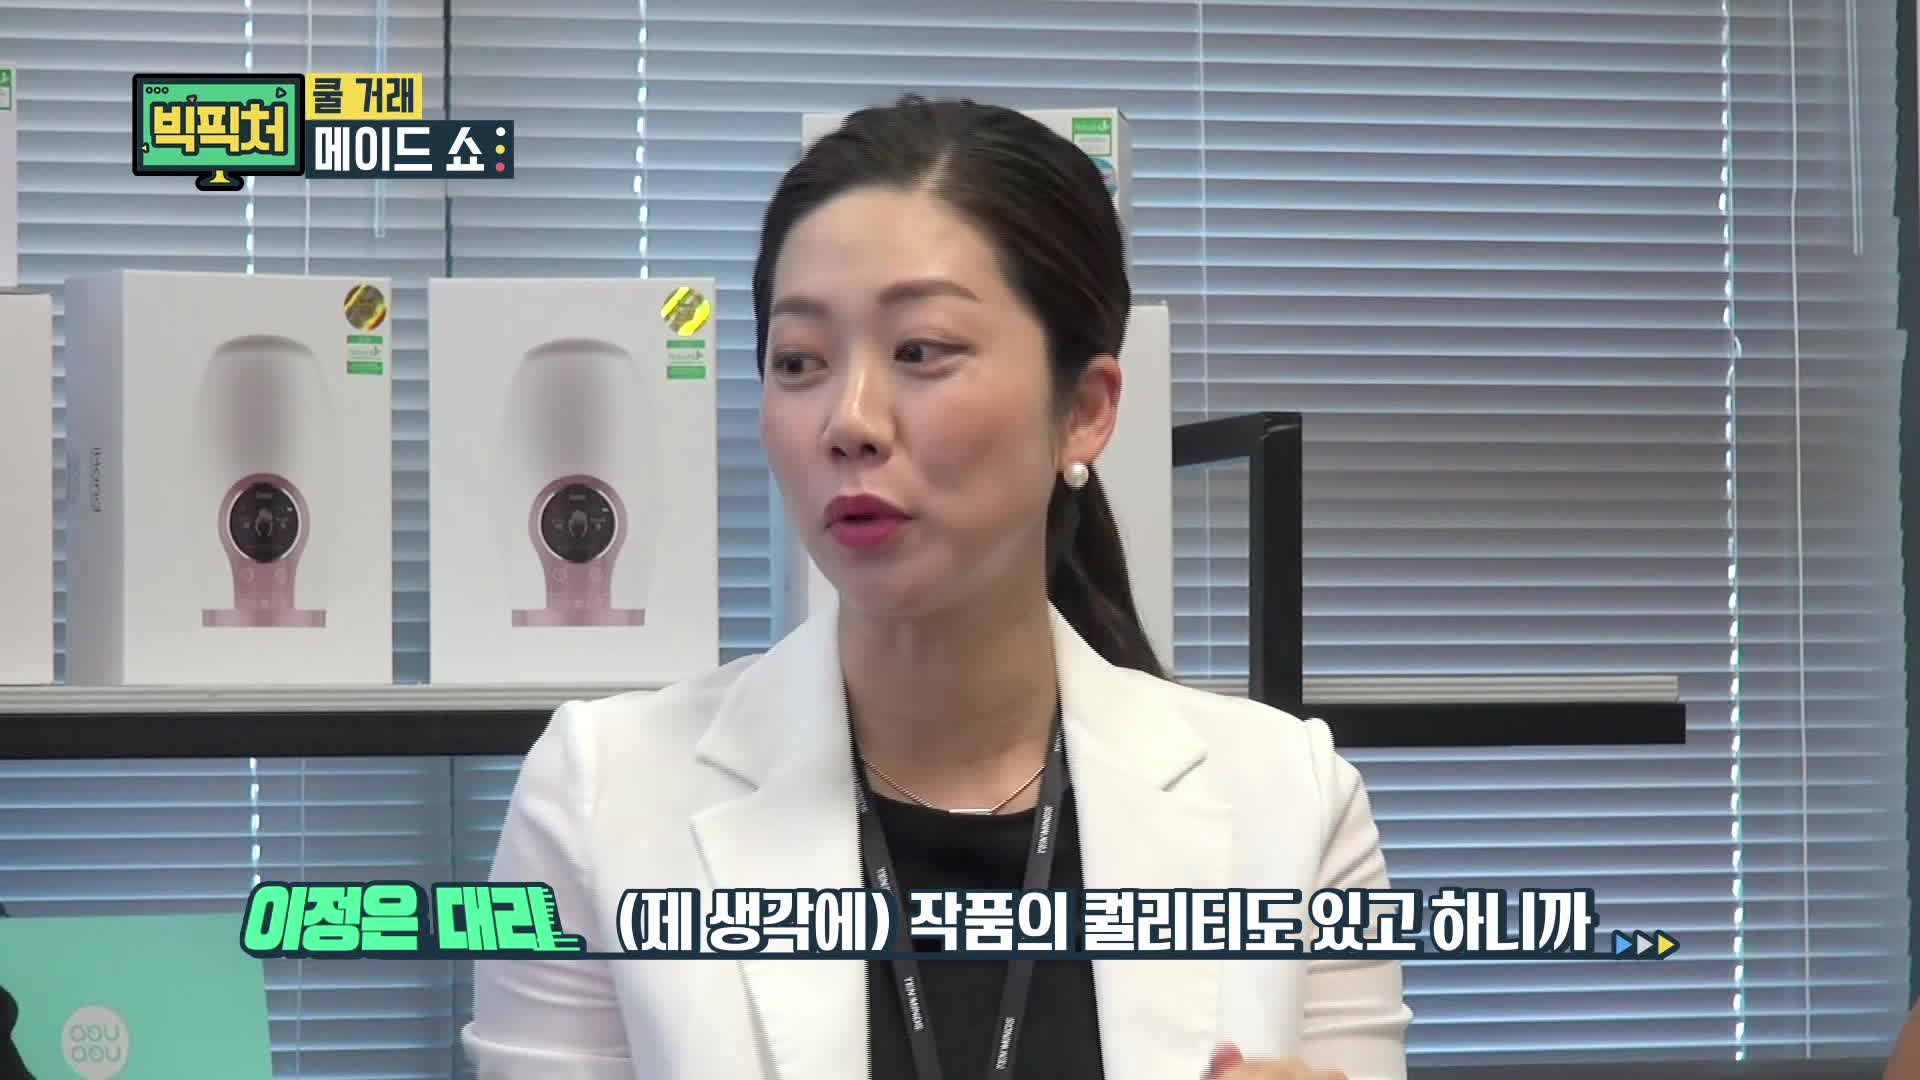 ep16_첫 메이드 돈, 조건, 성공적???